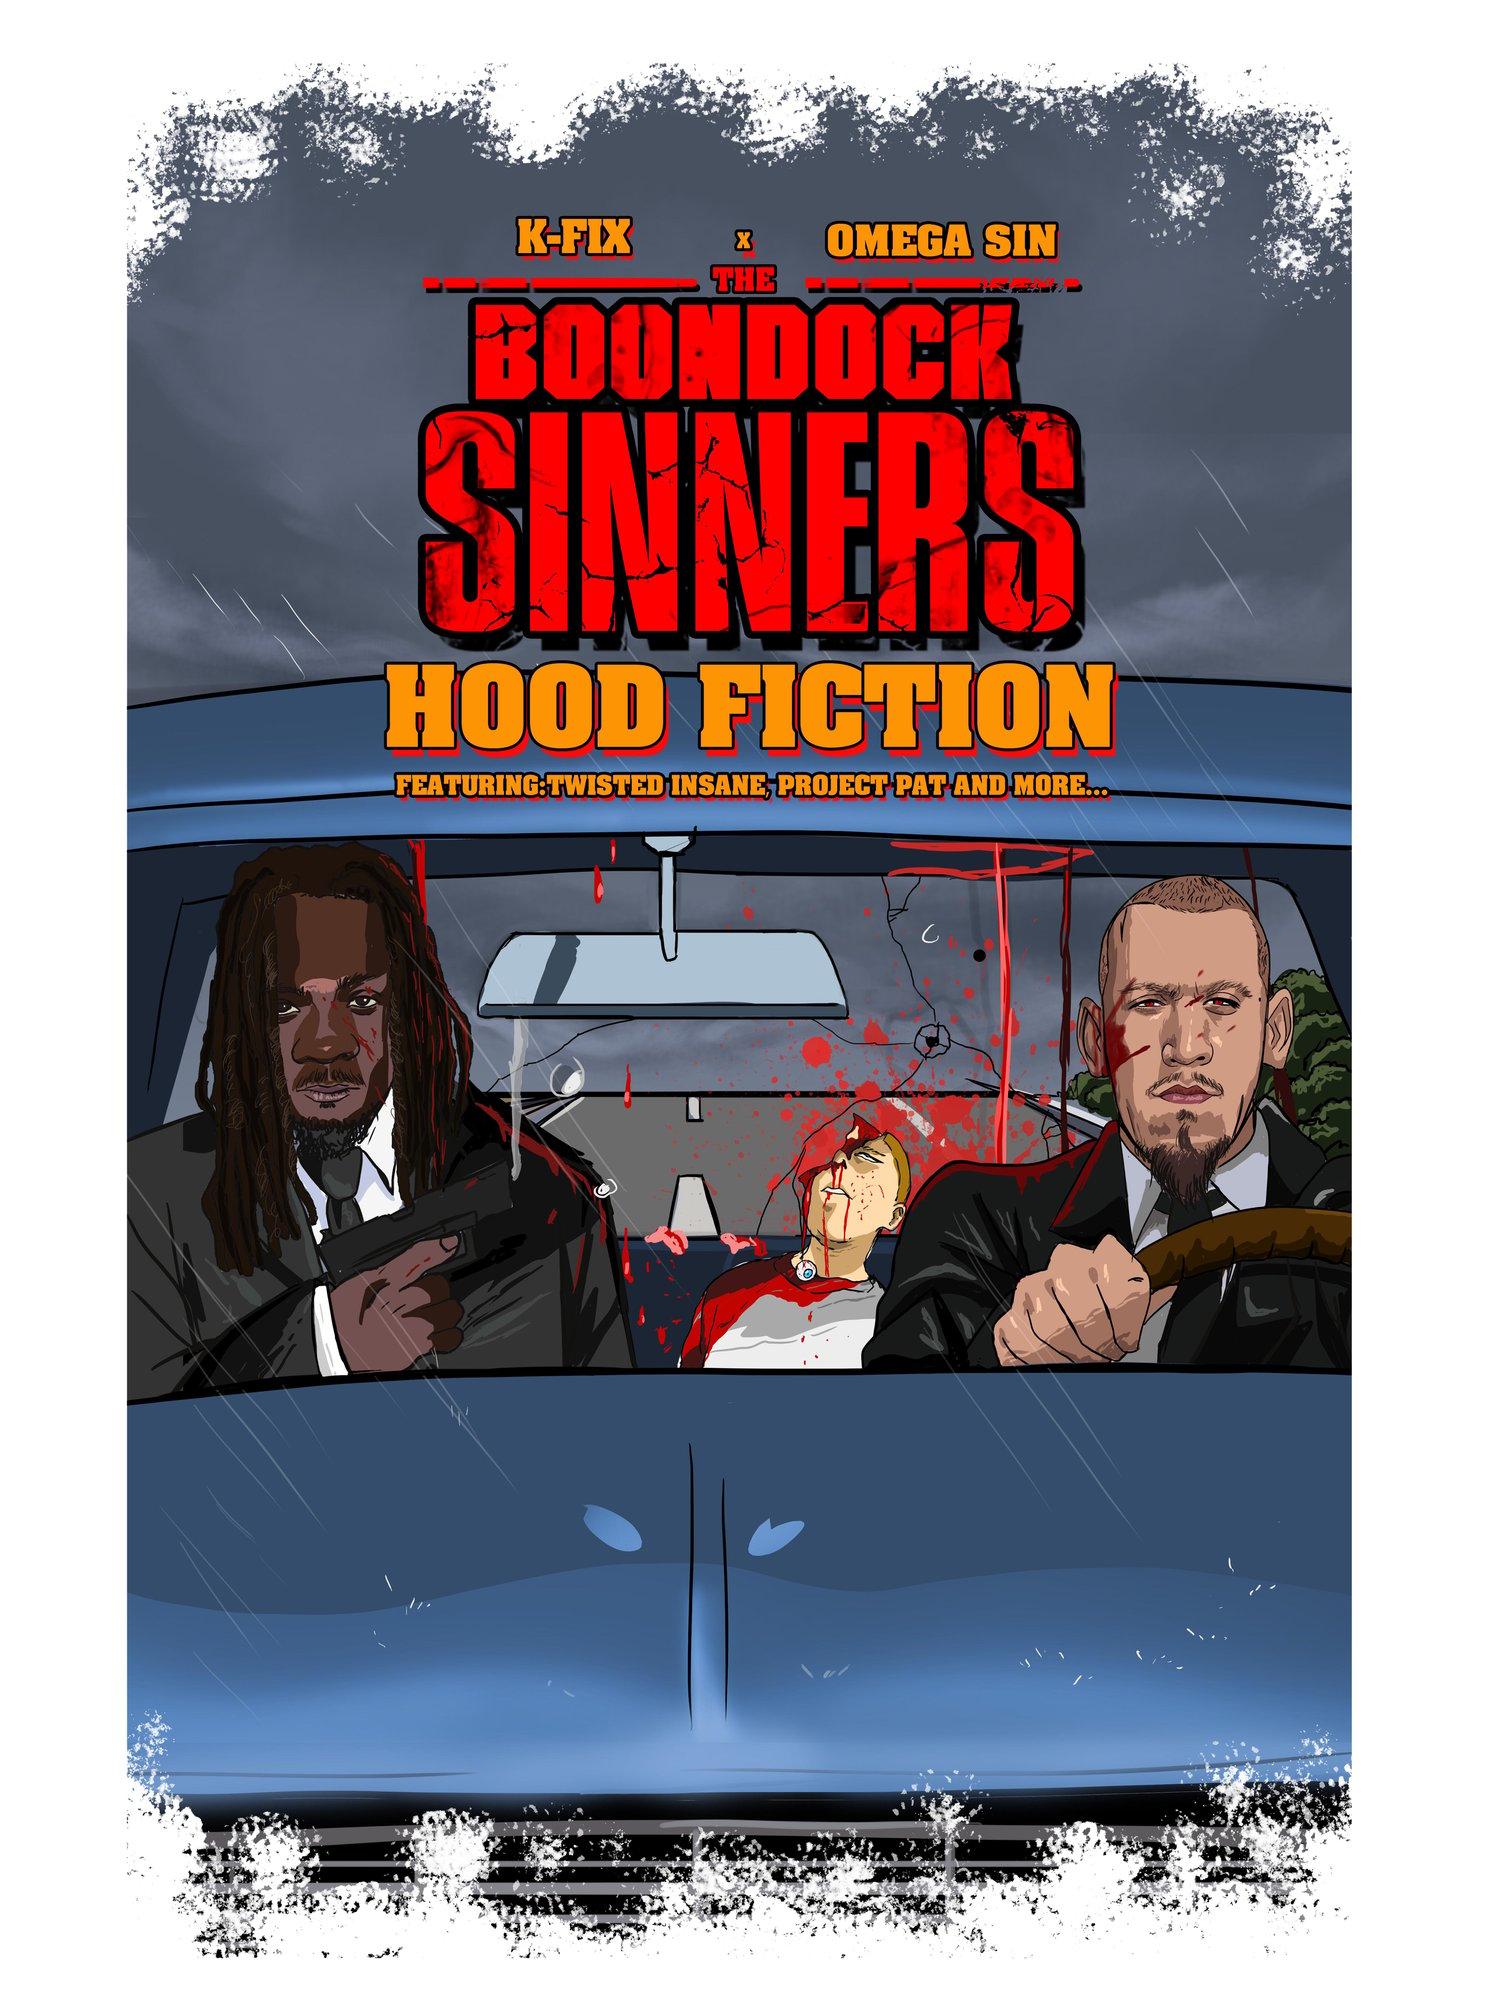 Image of Boondock Sinners T-Shirt